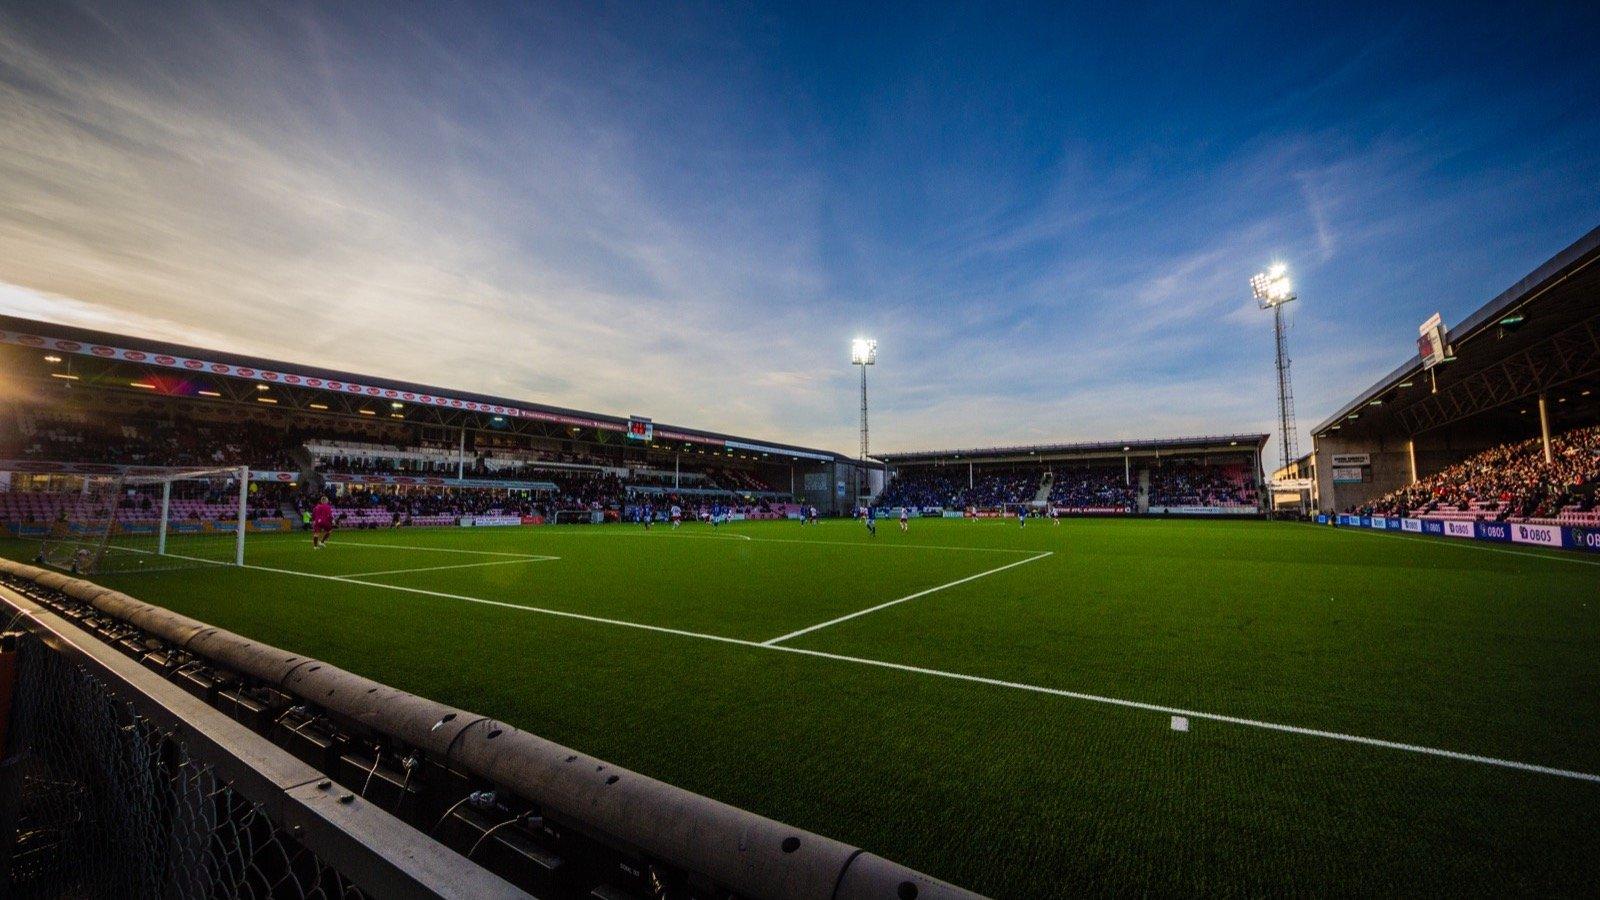 FFK - Sarpsborg 08 - NM Cup, stadion